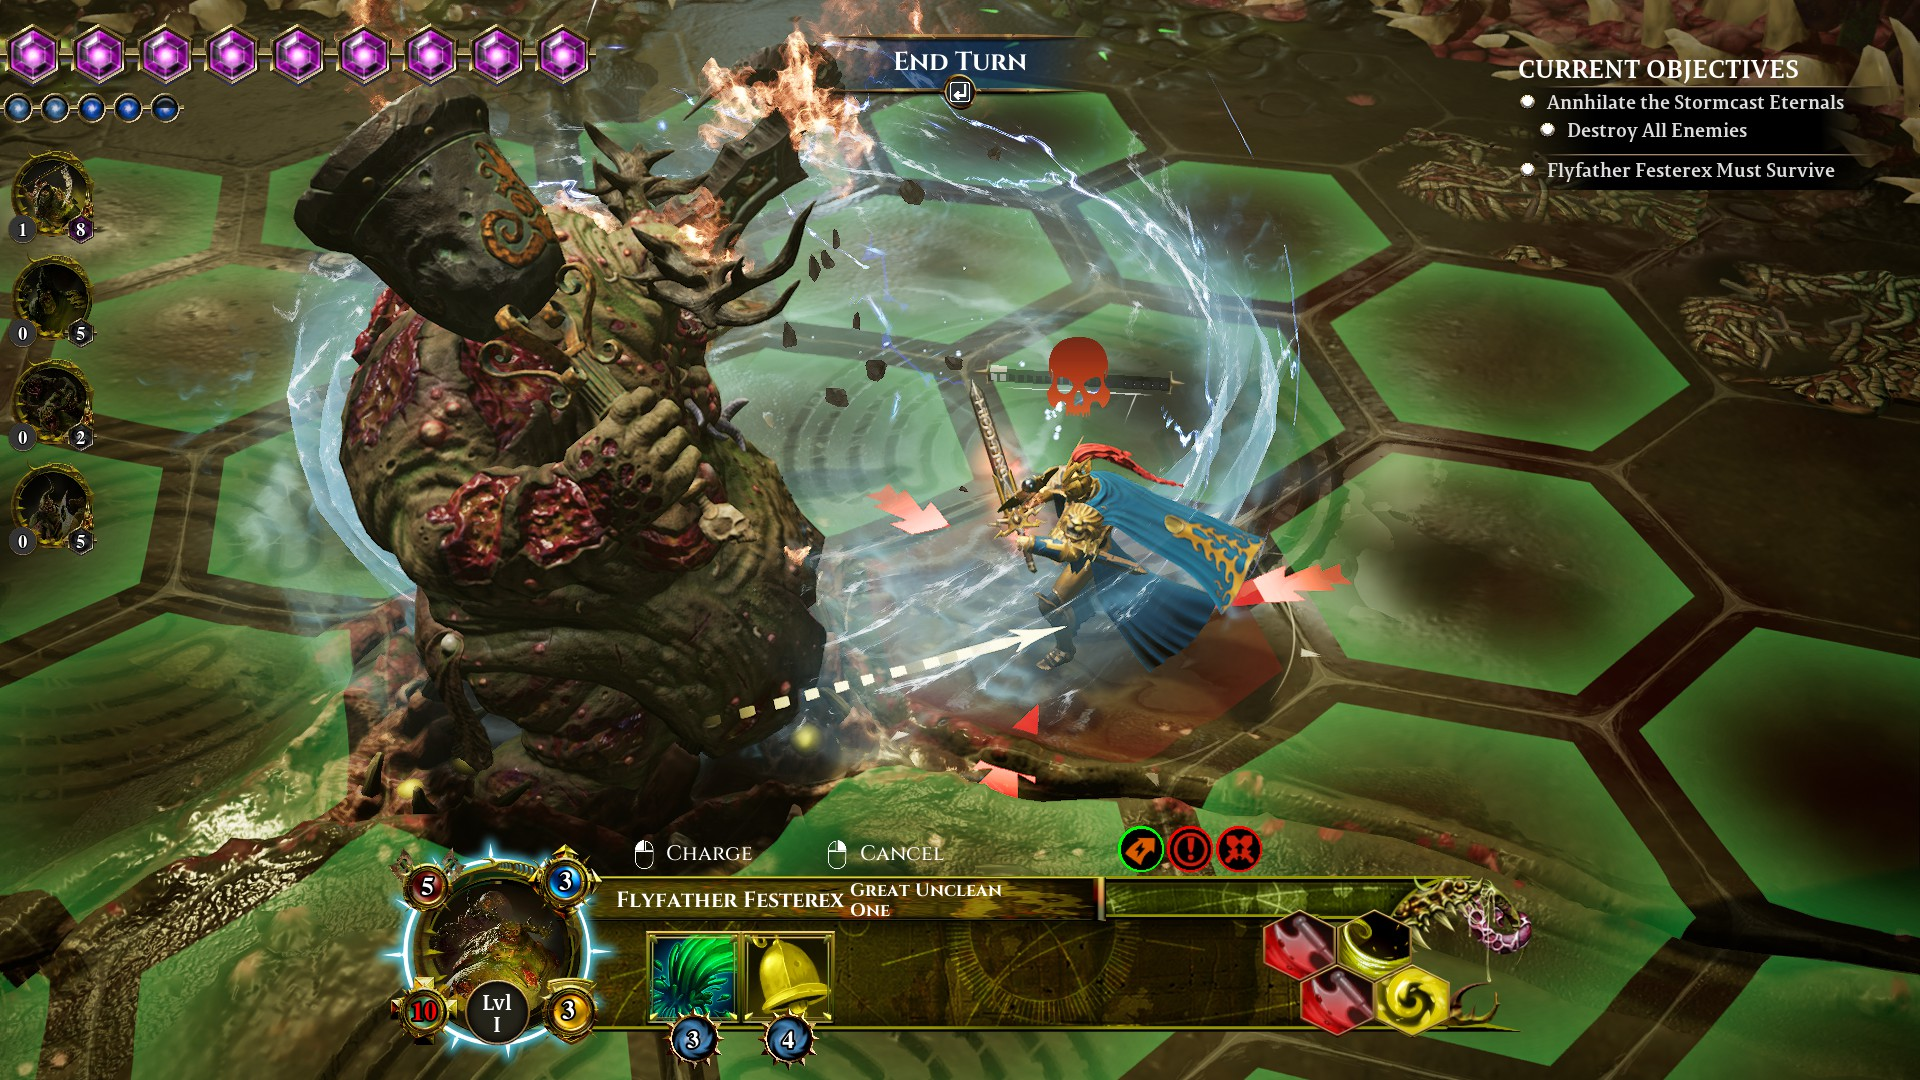 warhammer-age-of-sigmar-storm-ground-pc-screenshot-2